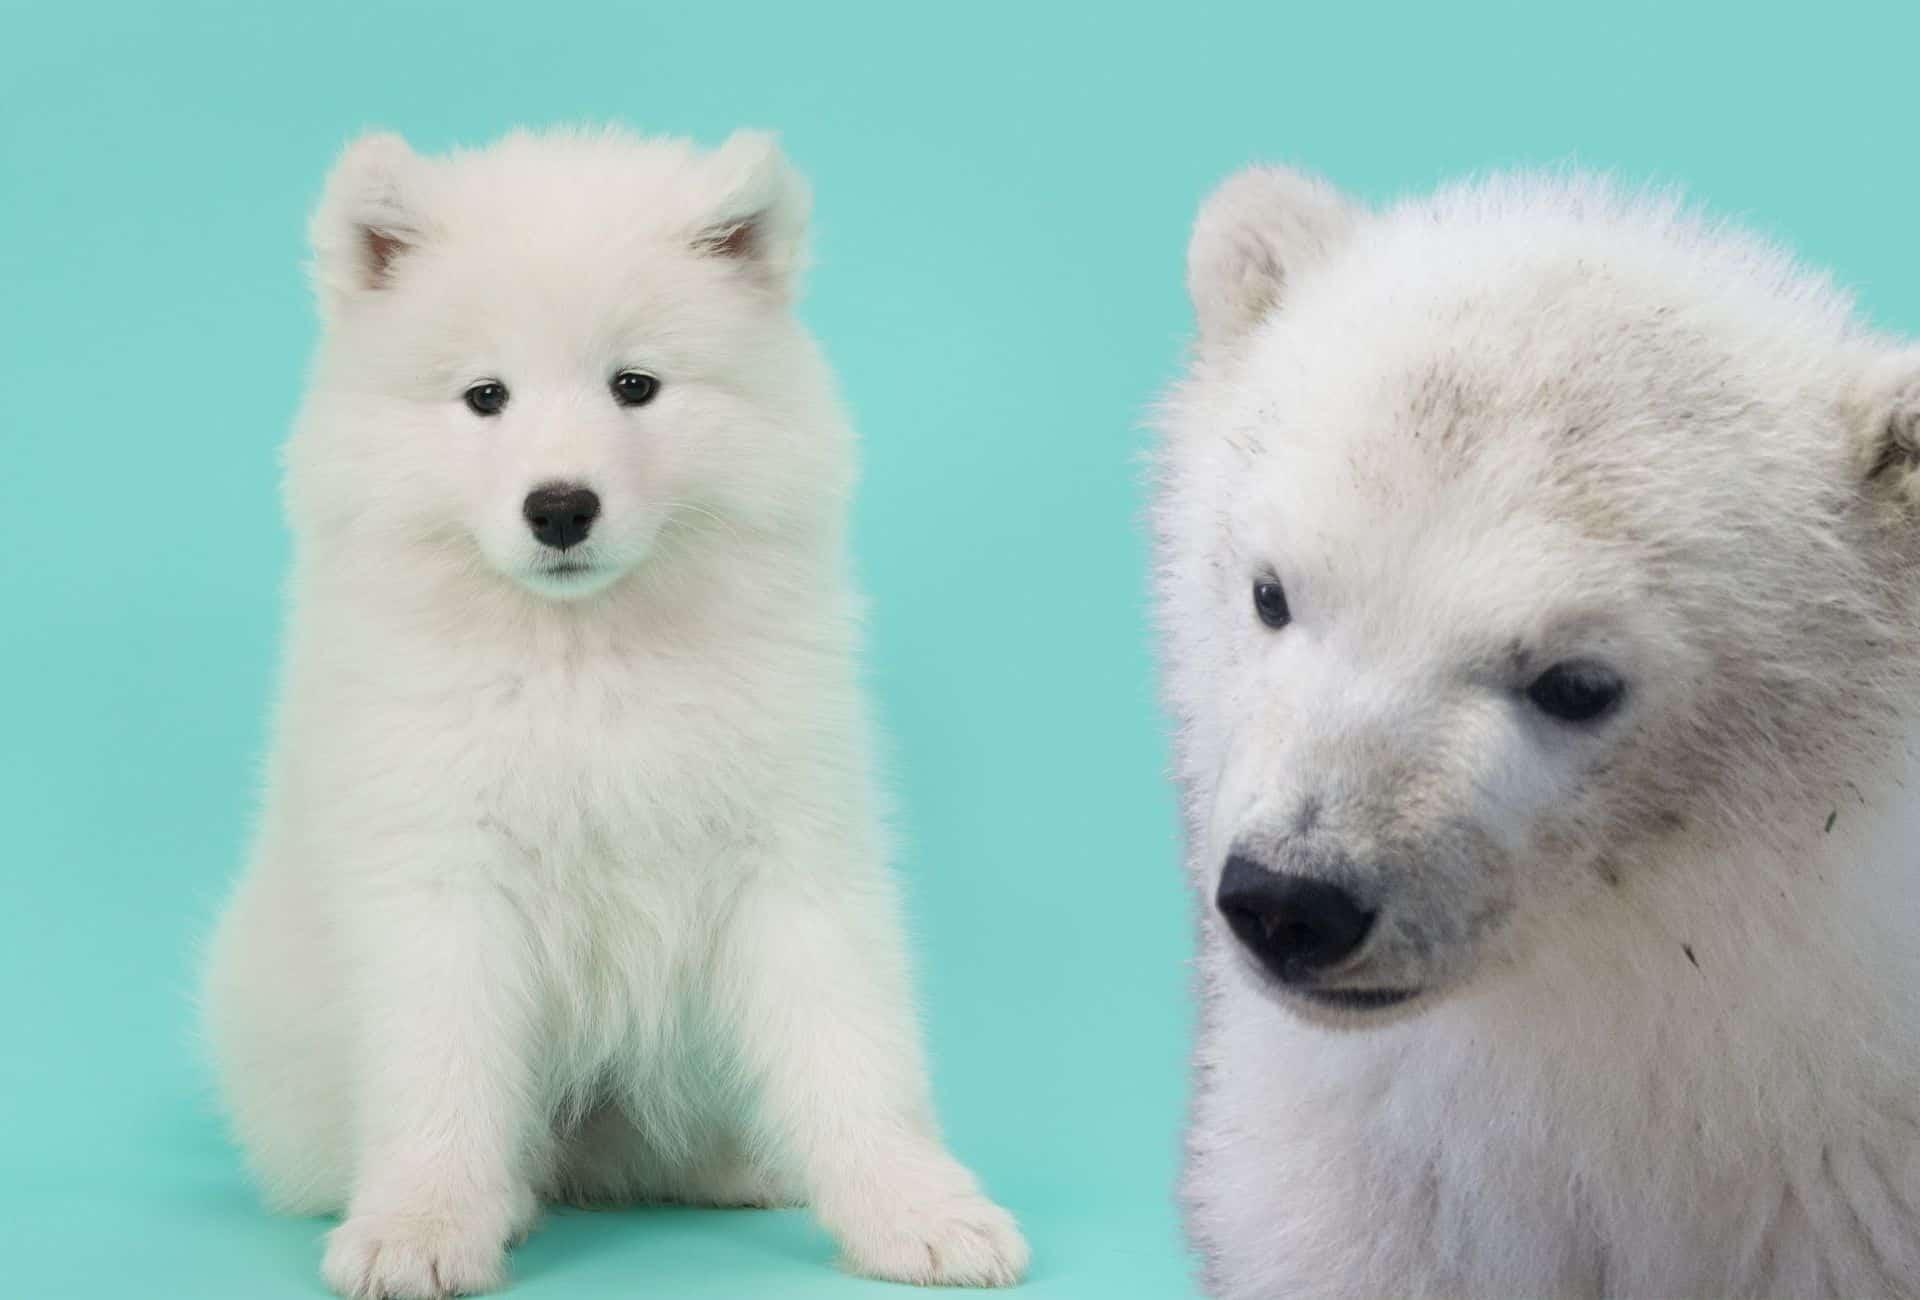 Samoyed with similar coat and ears like a Polar bear cub.